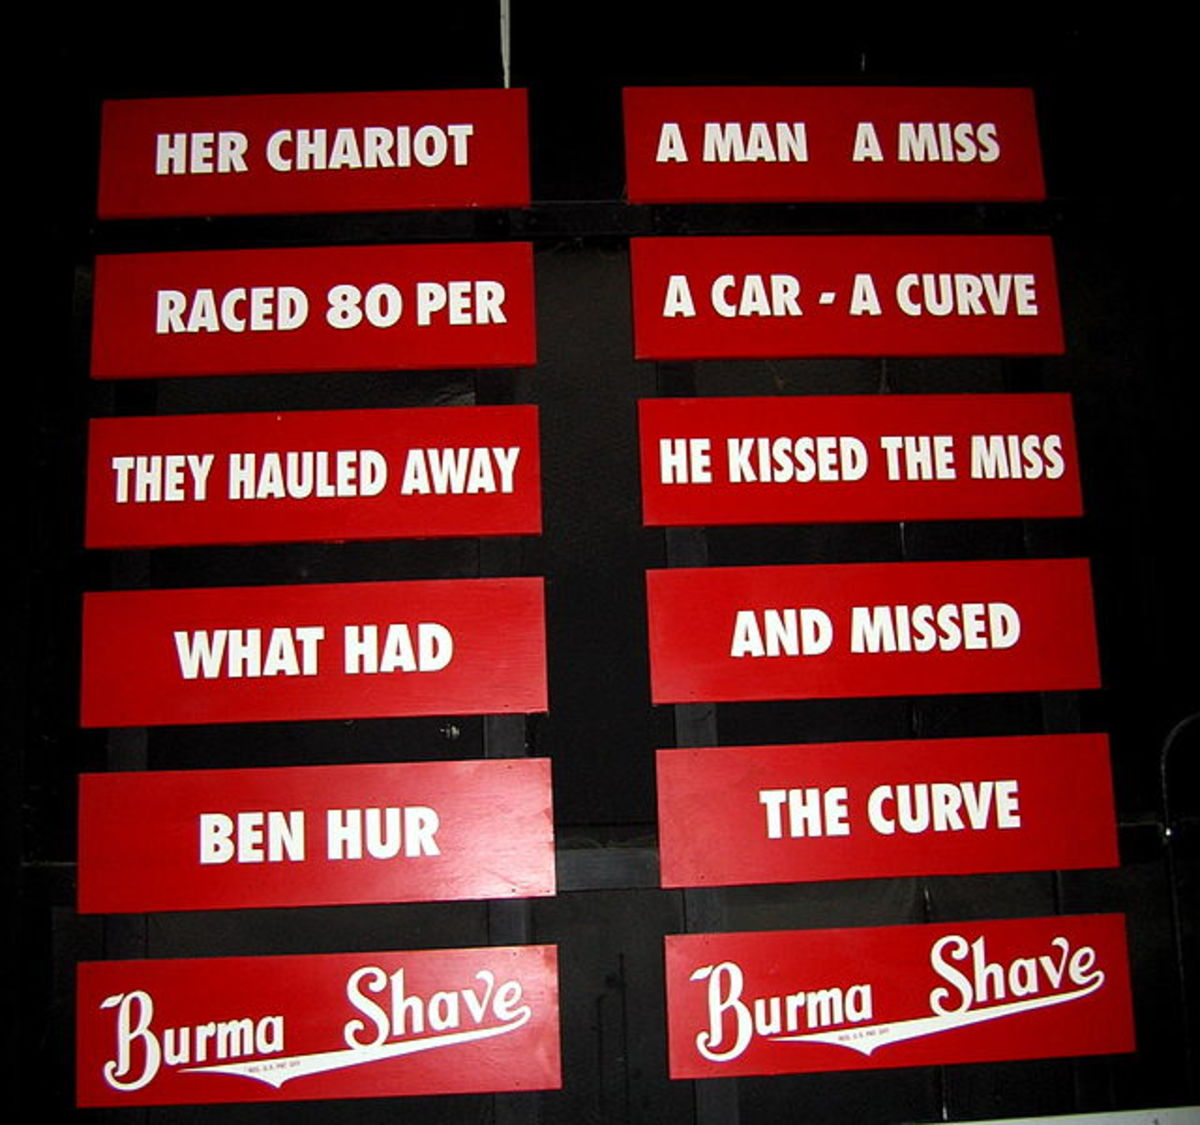 Burma Shave slogans